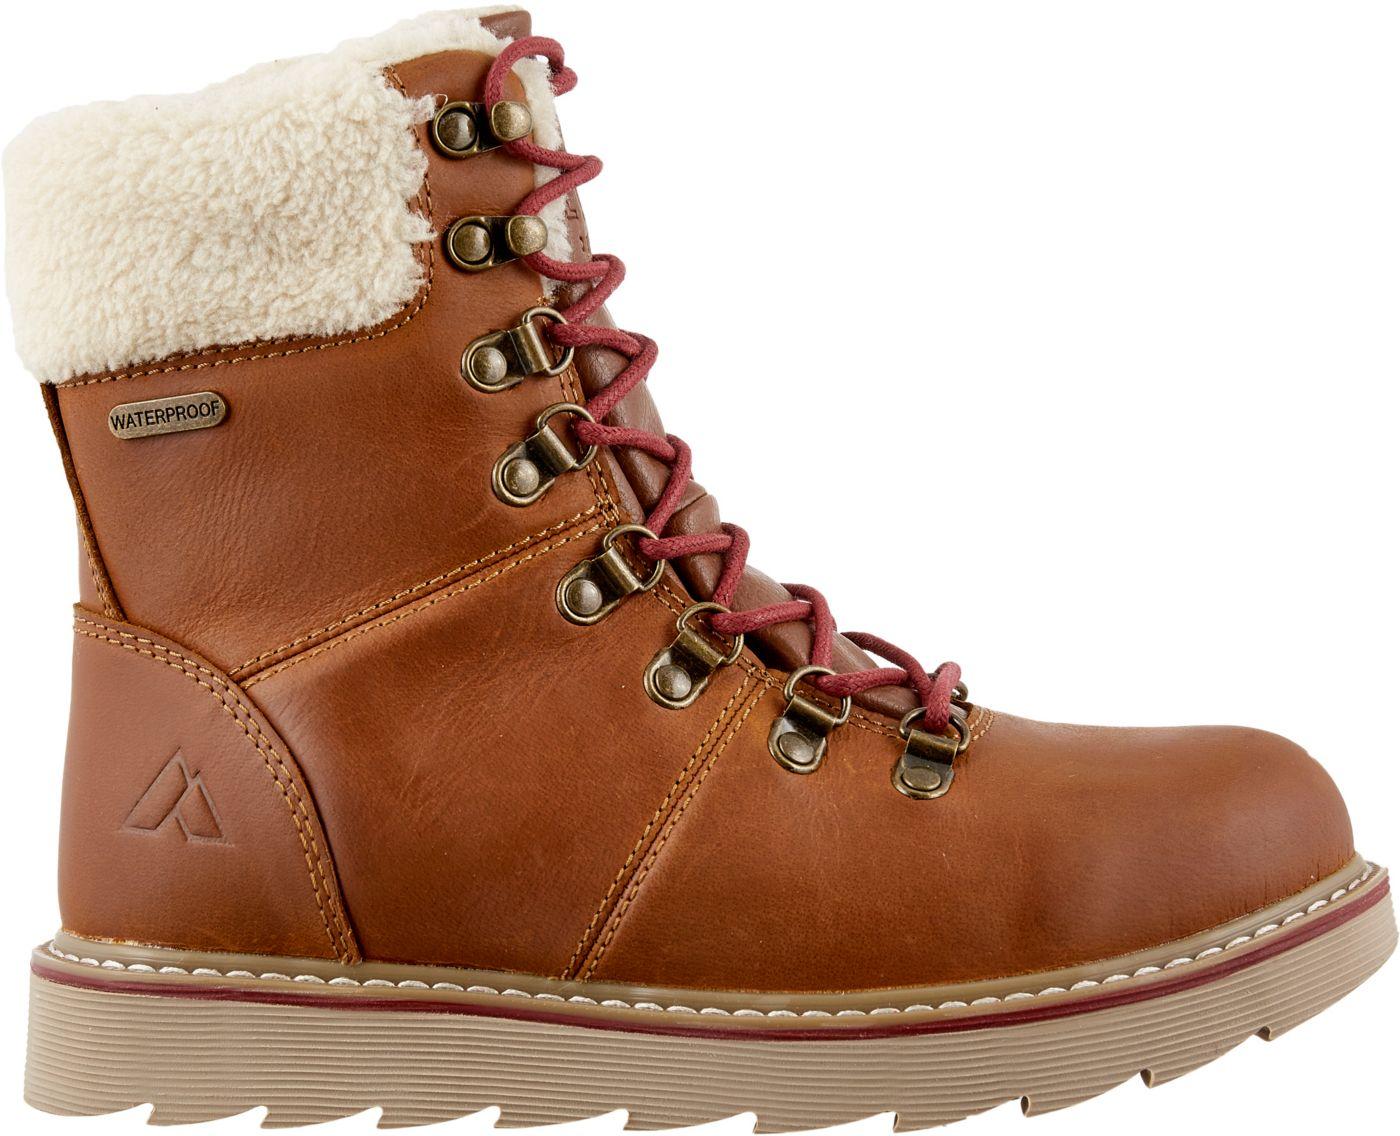 Alpine Design Women's Ember Ridge Leather 200g Waterproof Winter Boots